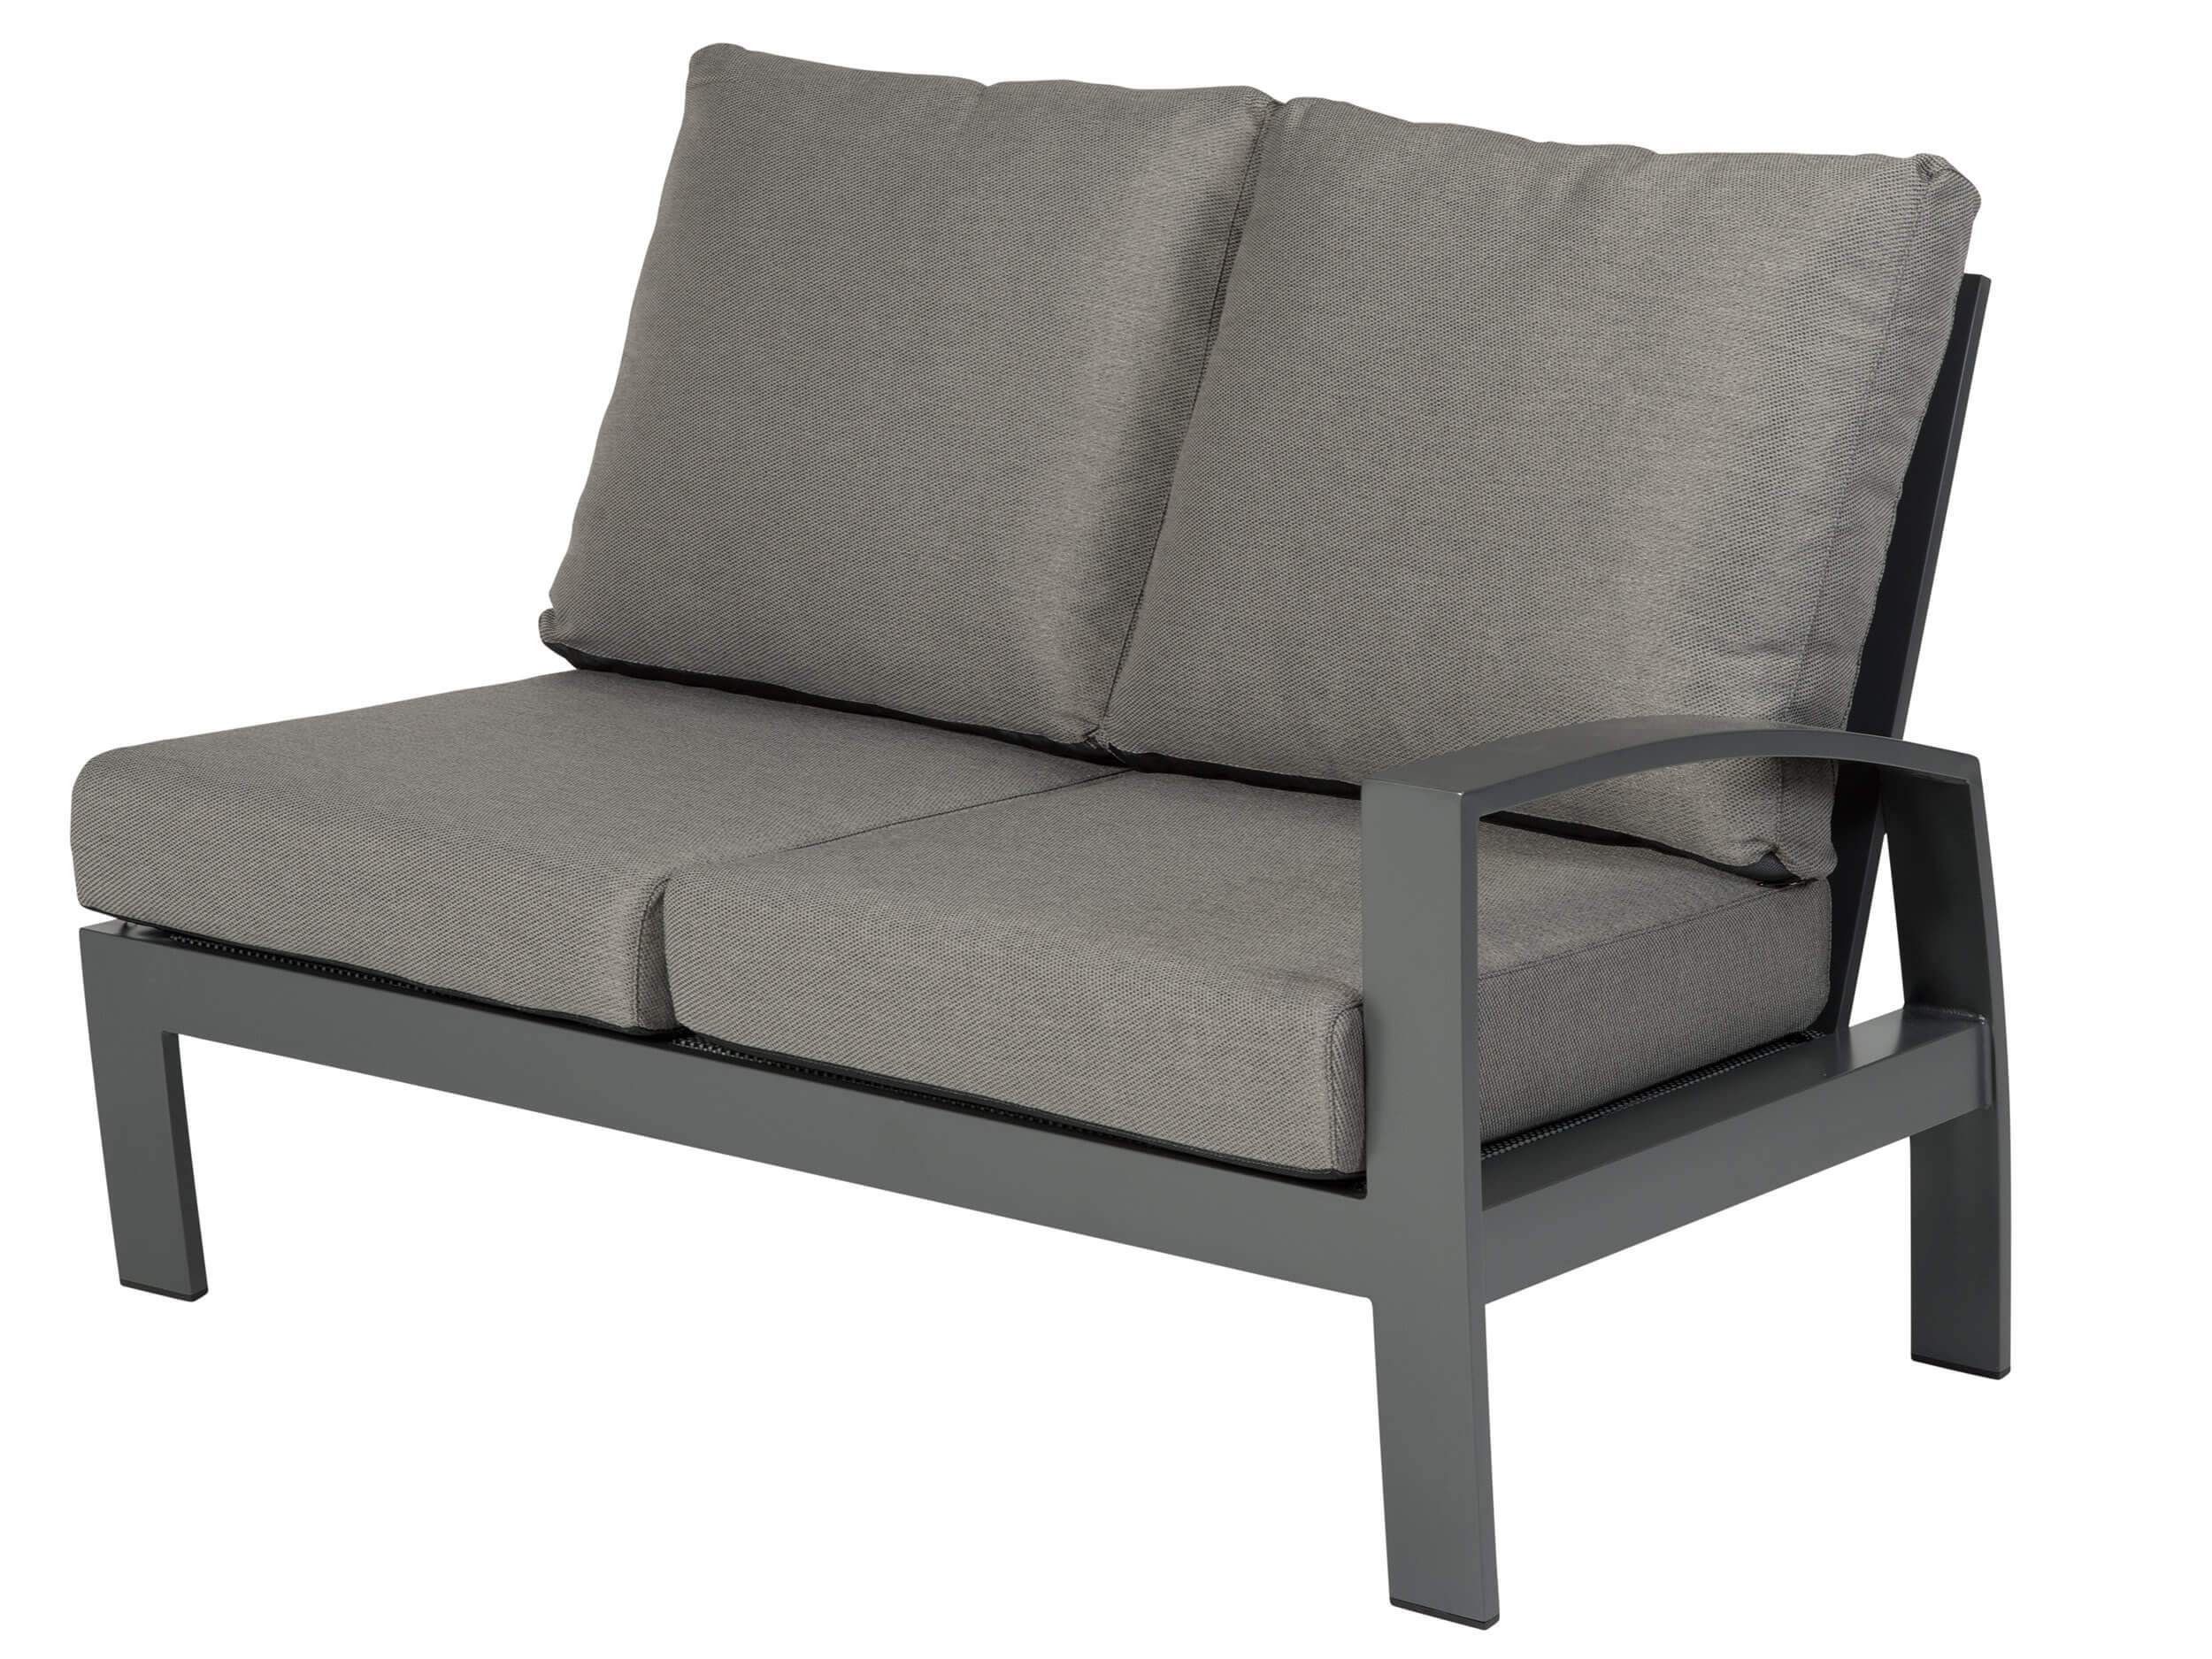 alu lounge 2 sitzer links offen sofa valencia anthrazit